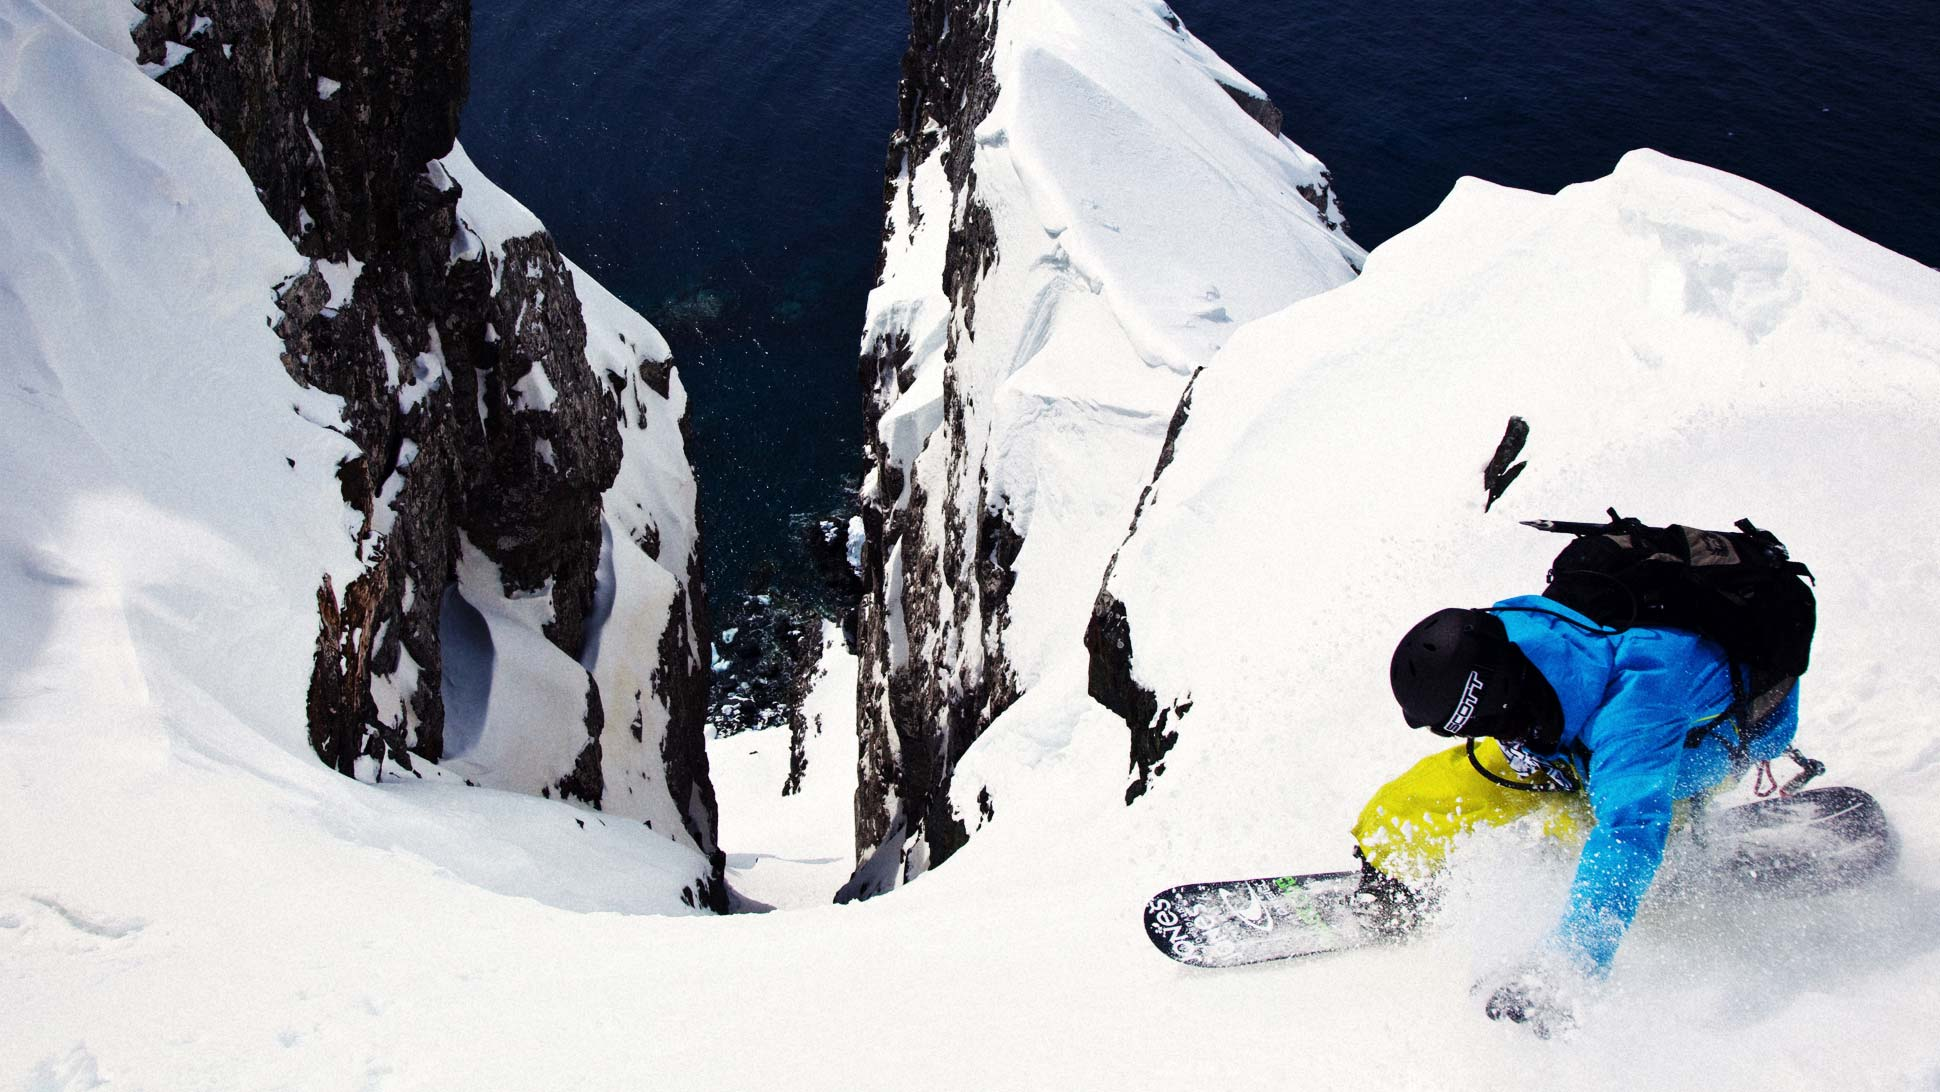 Jeremy Jones skiing the steep